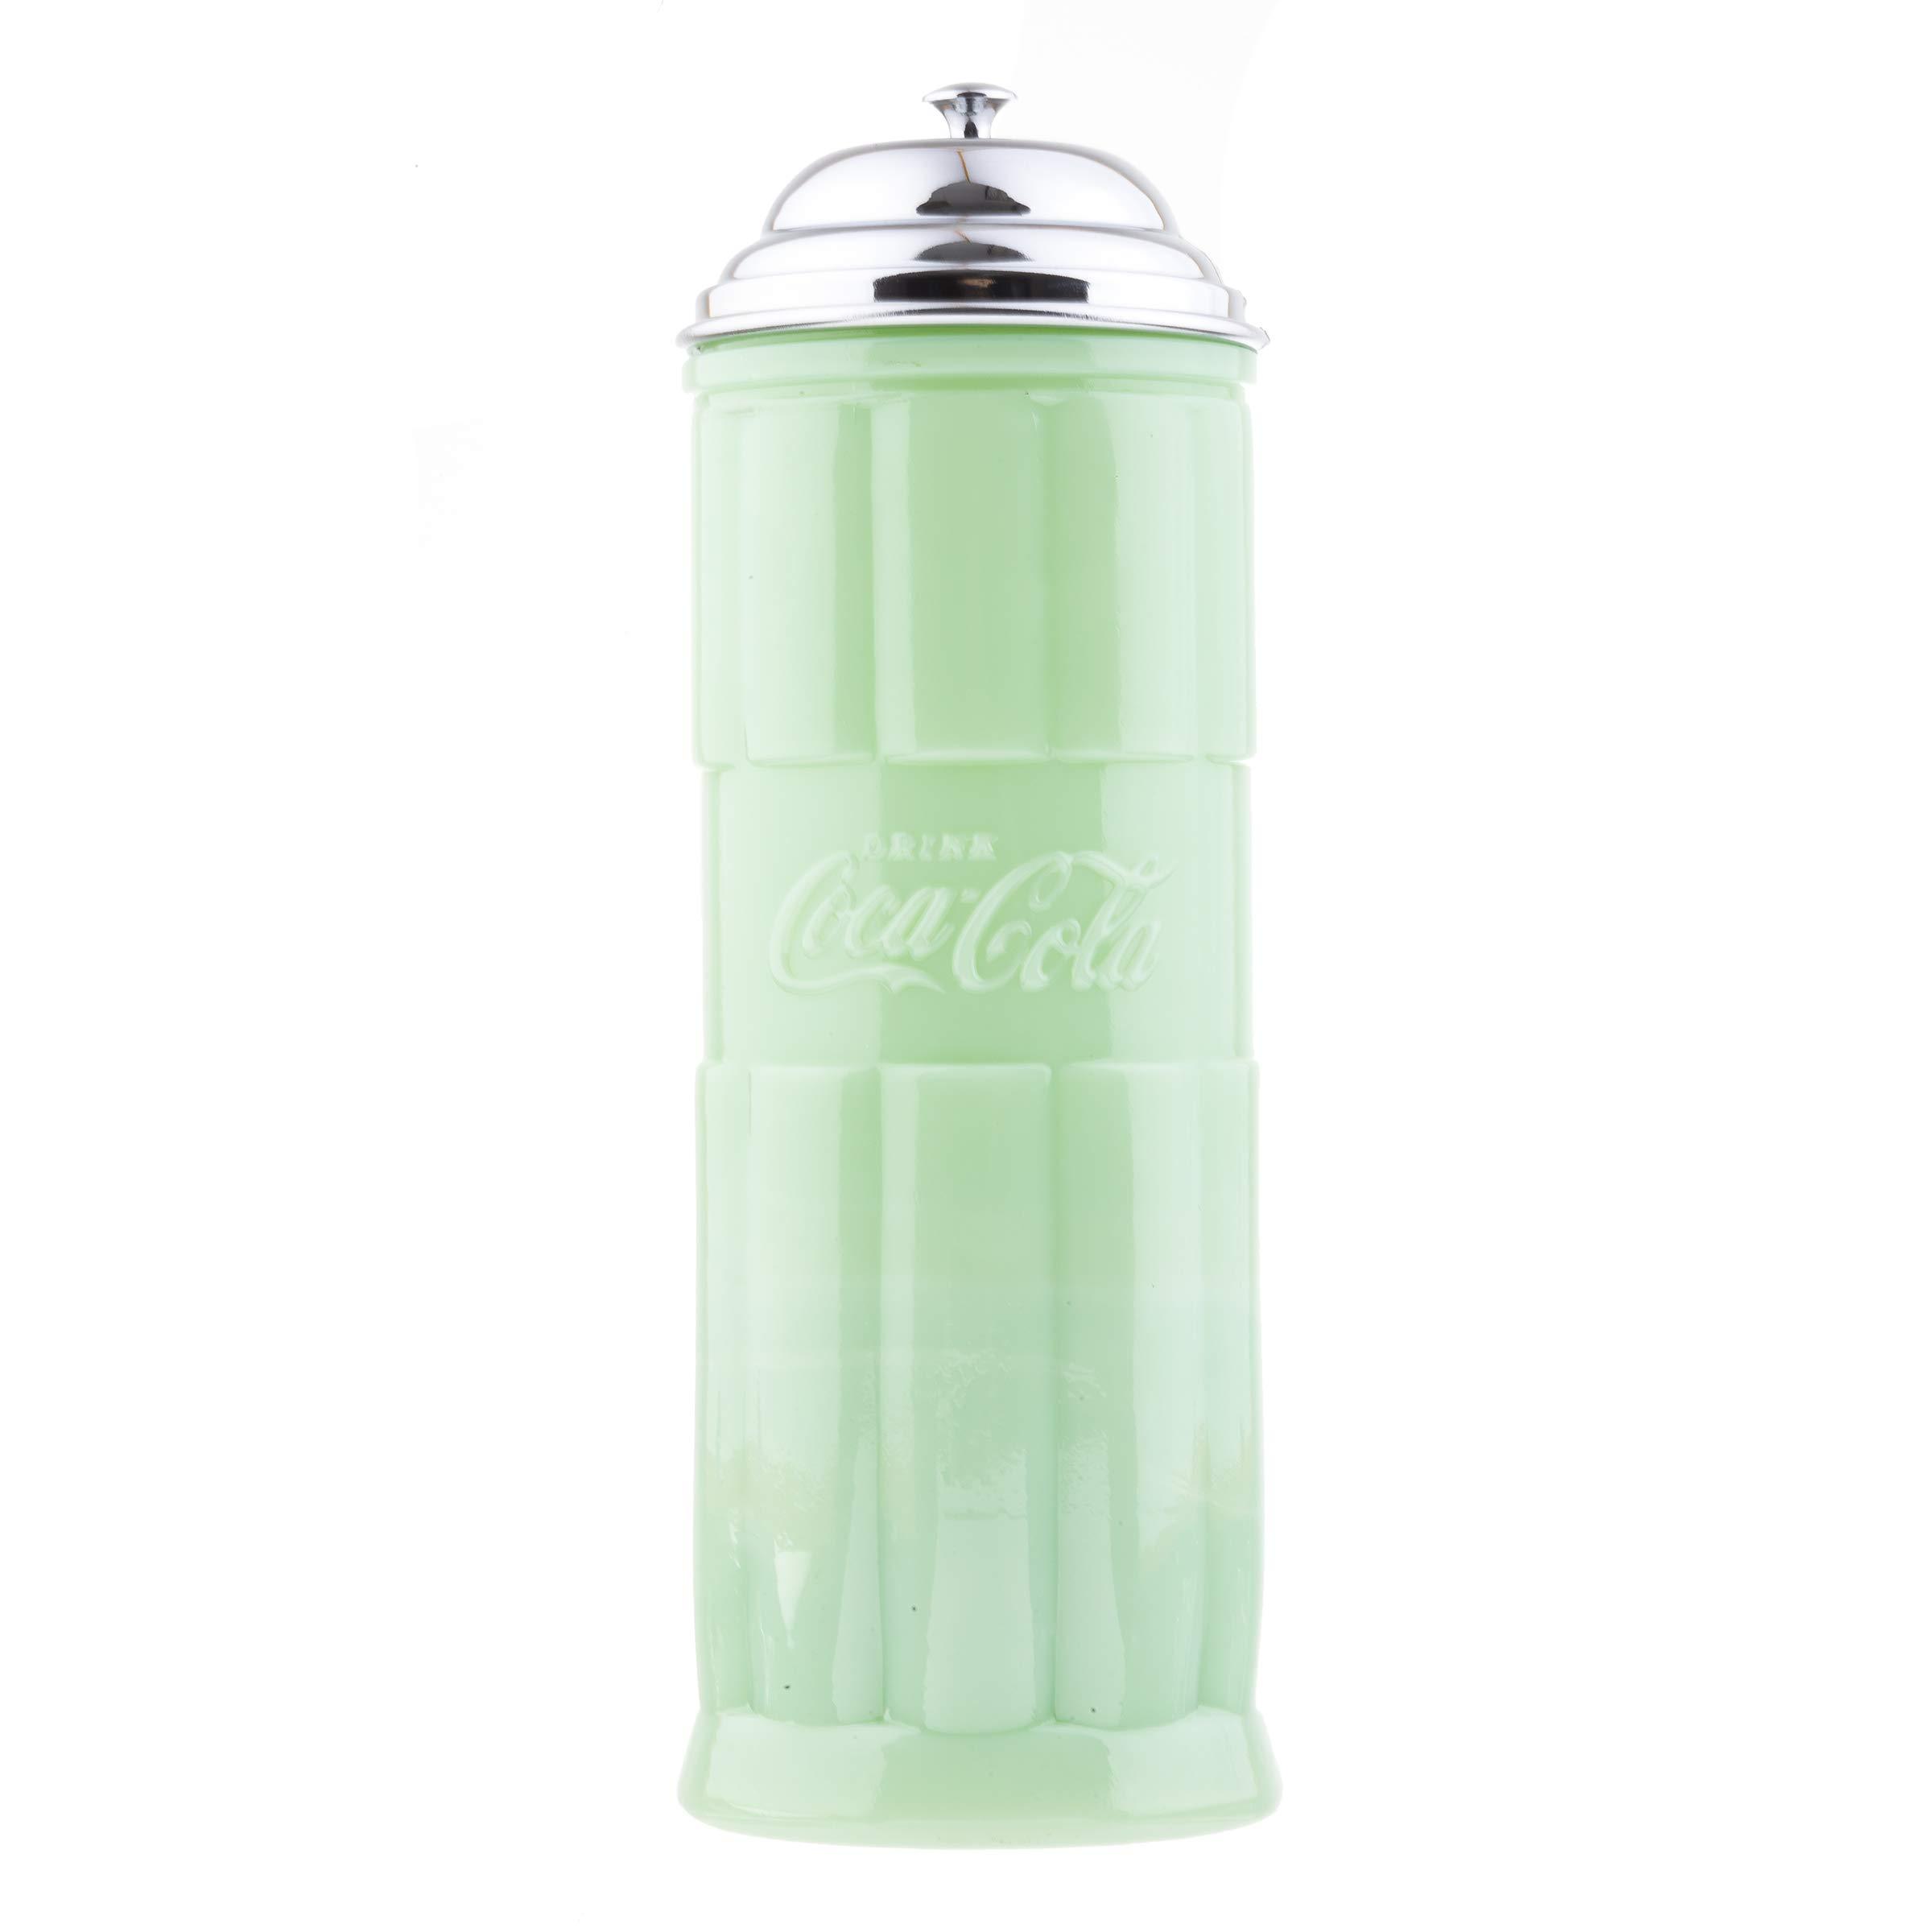 TableCraft's Coca-Cola Jadeite Straw Jar 4 x 4 x 11.25'', Green